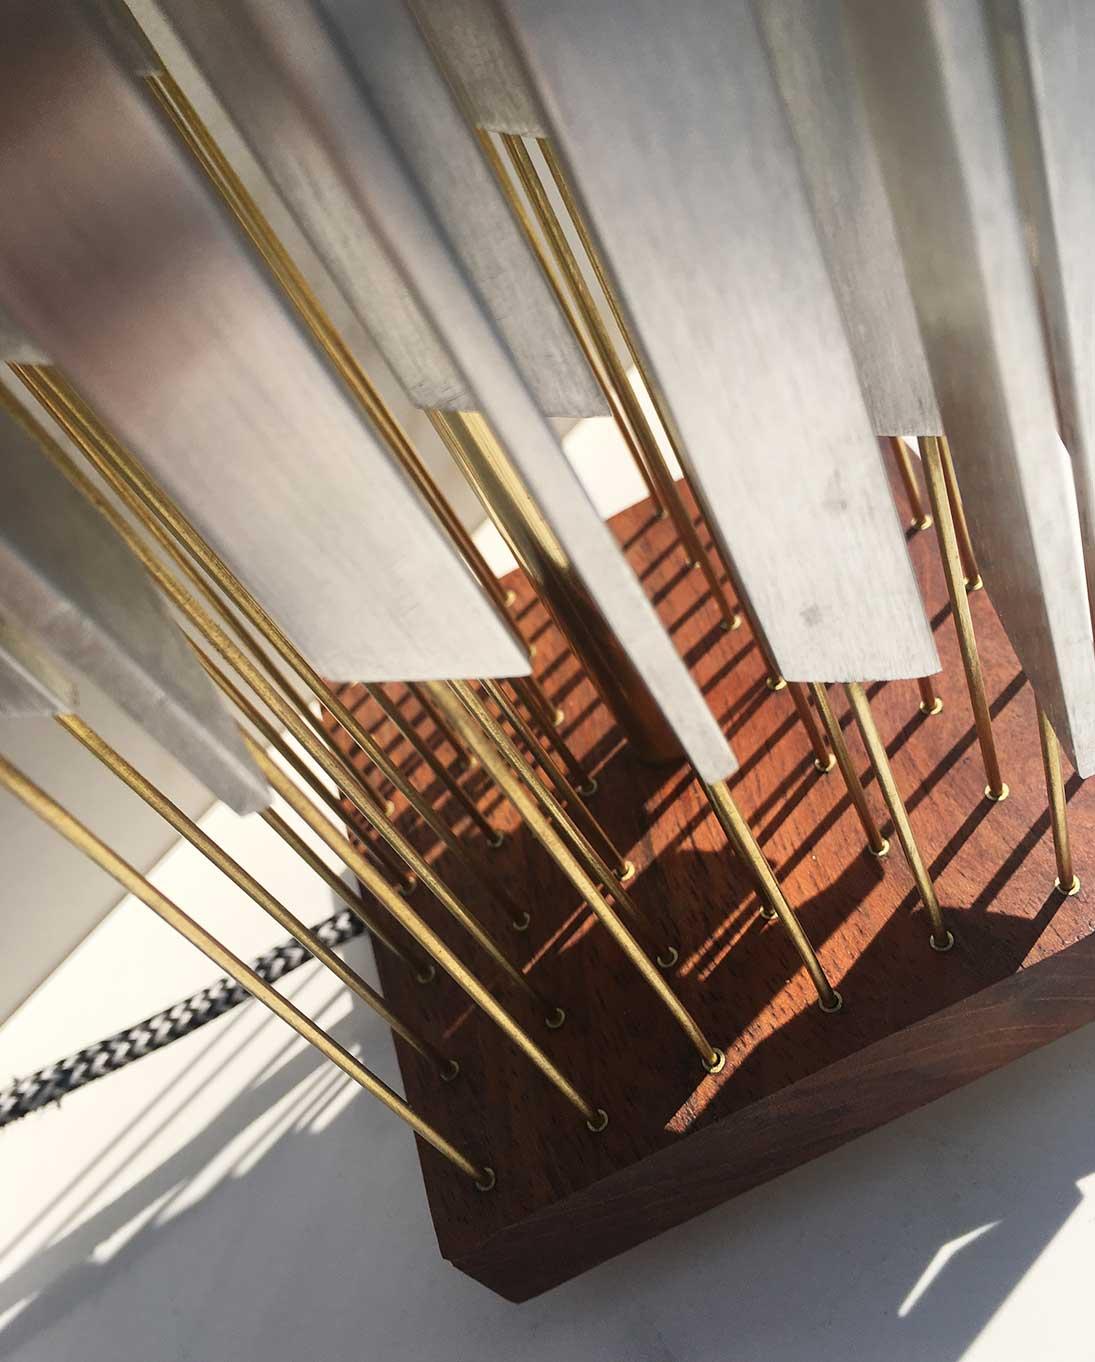 gallery-levitate-detail.jpg